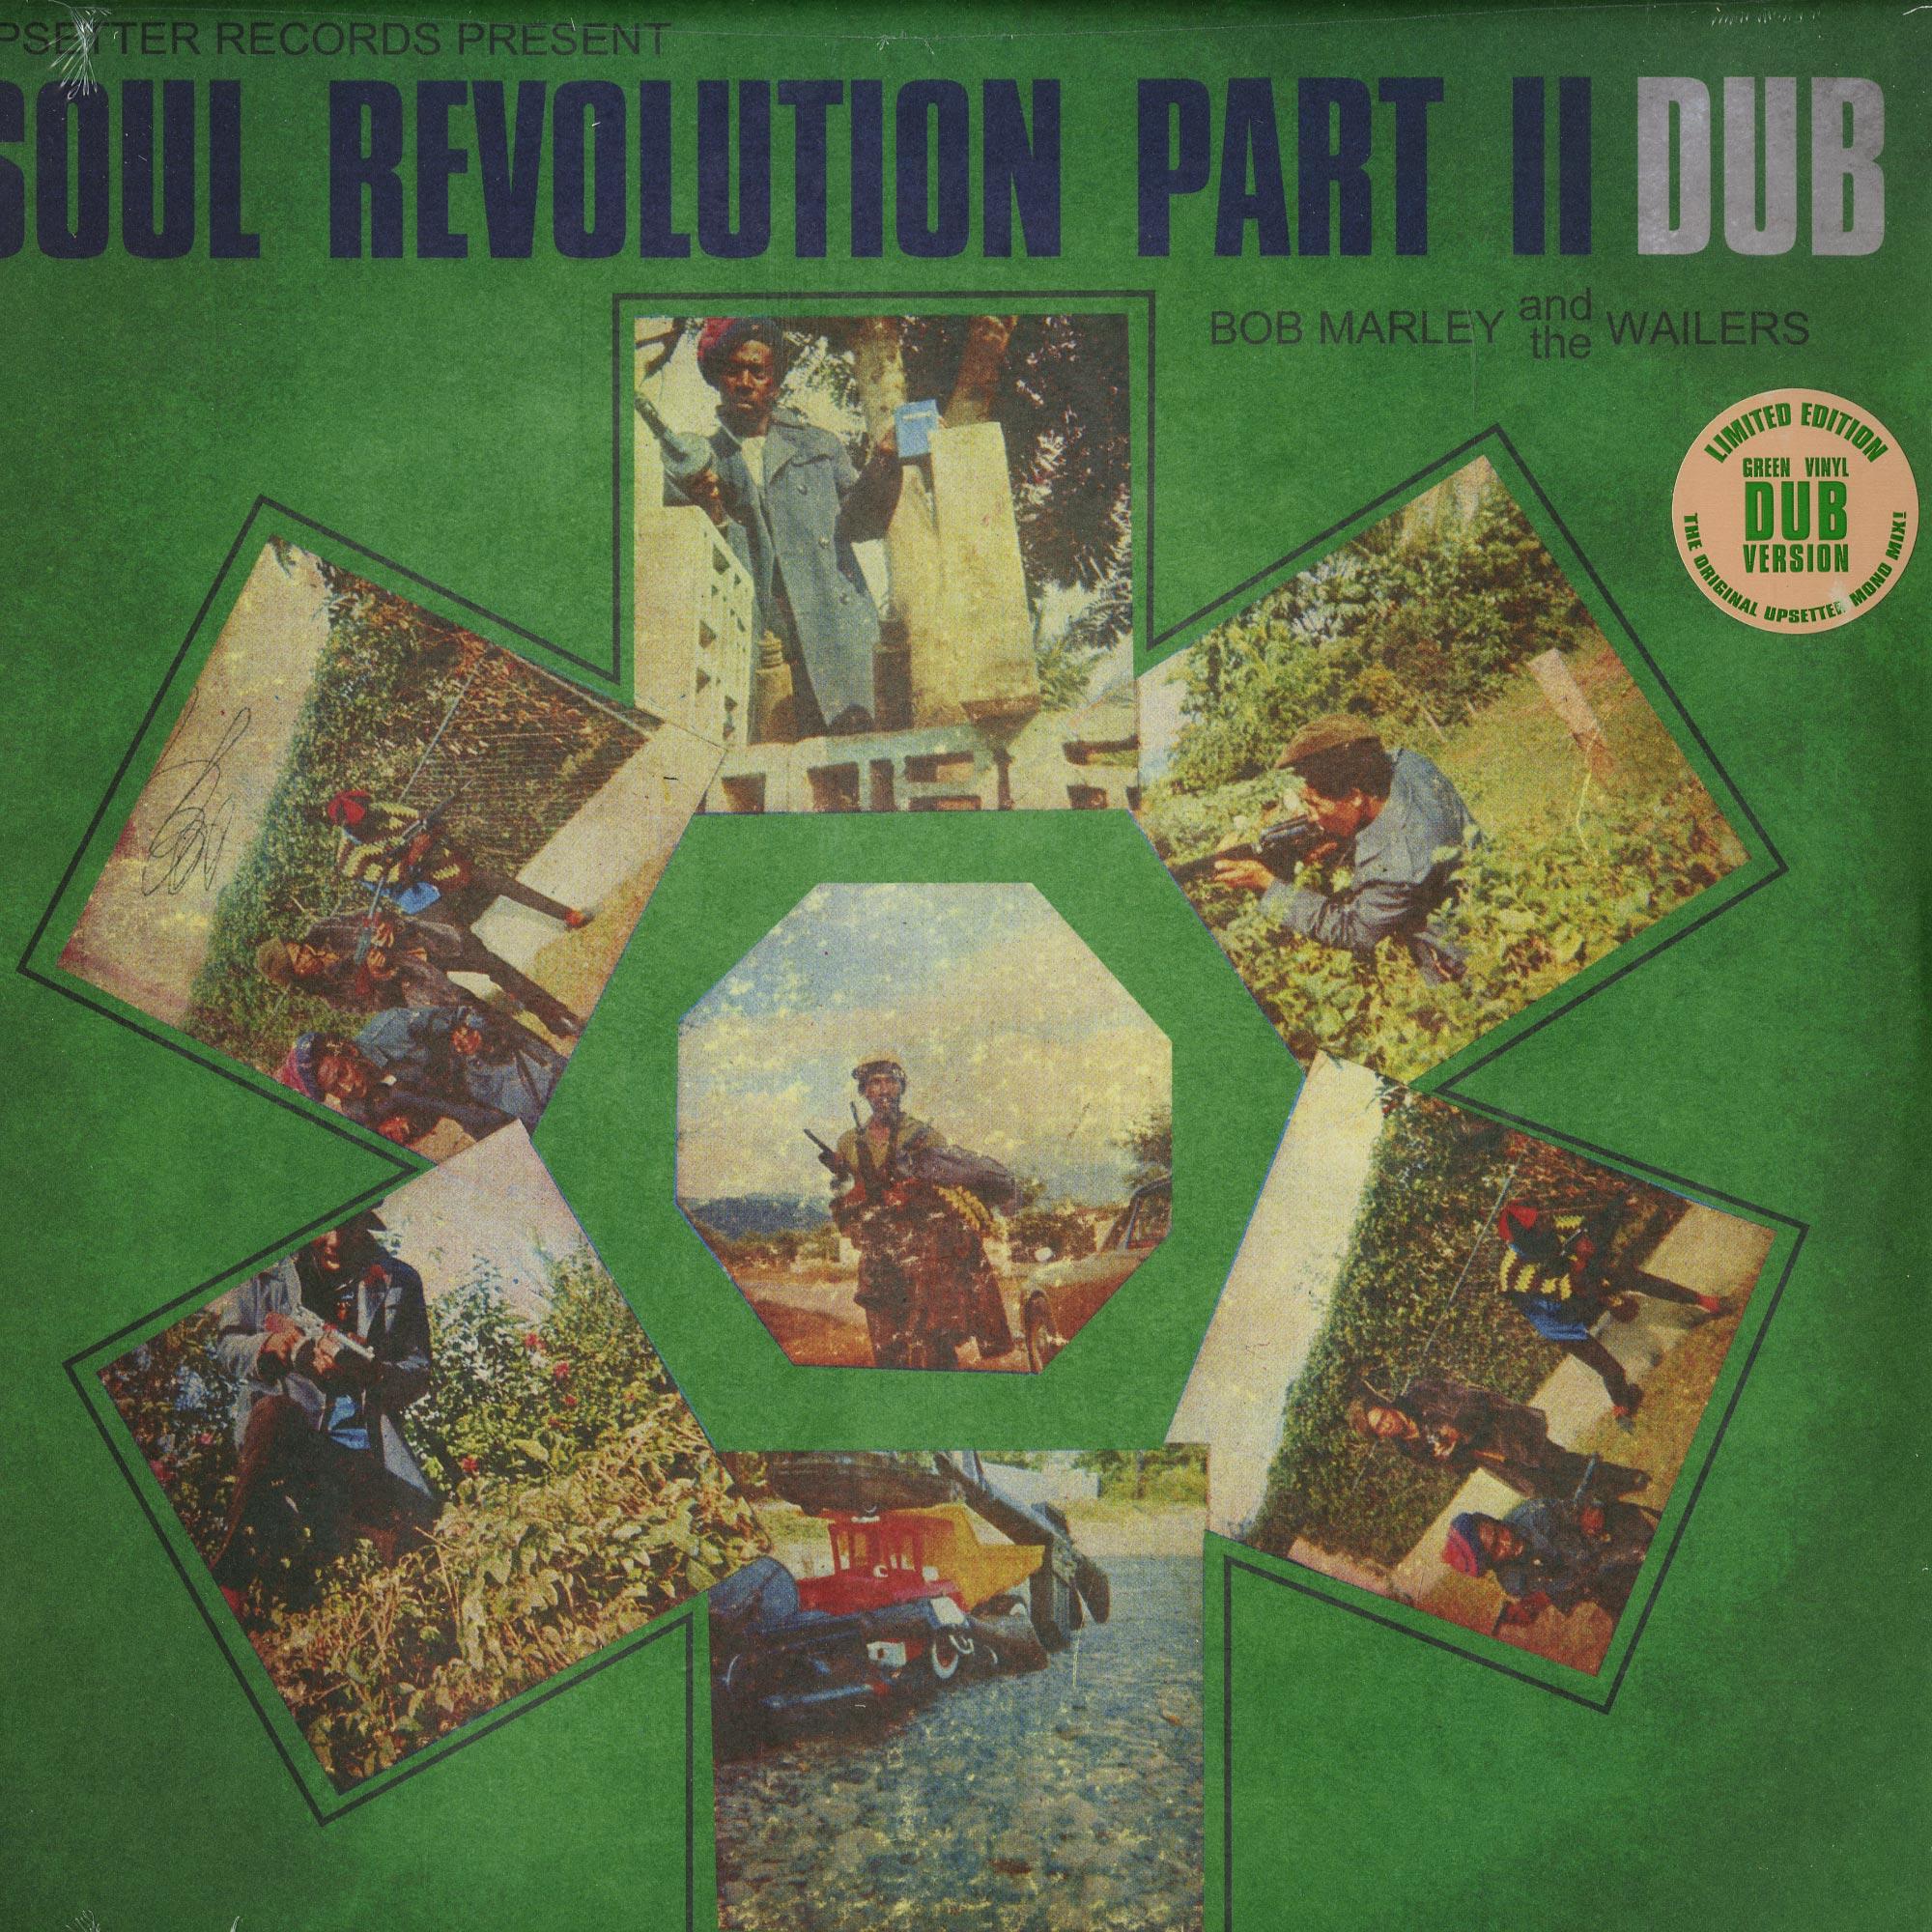 Bob Marley & The Wailers - SOUL REVOLUTION PART 2 DUB